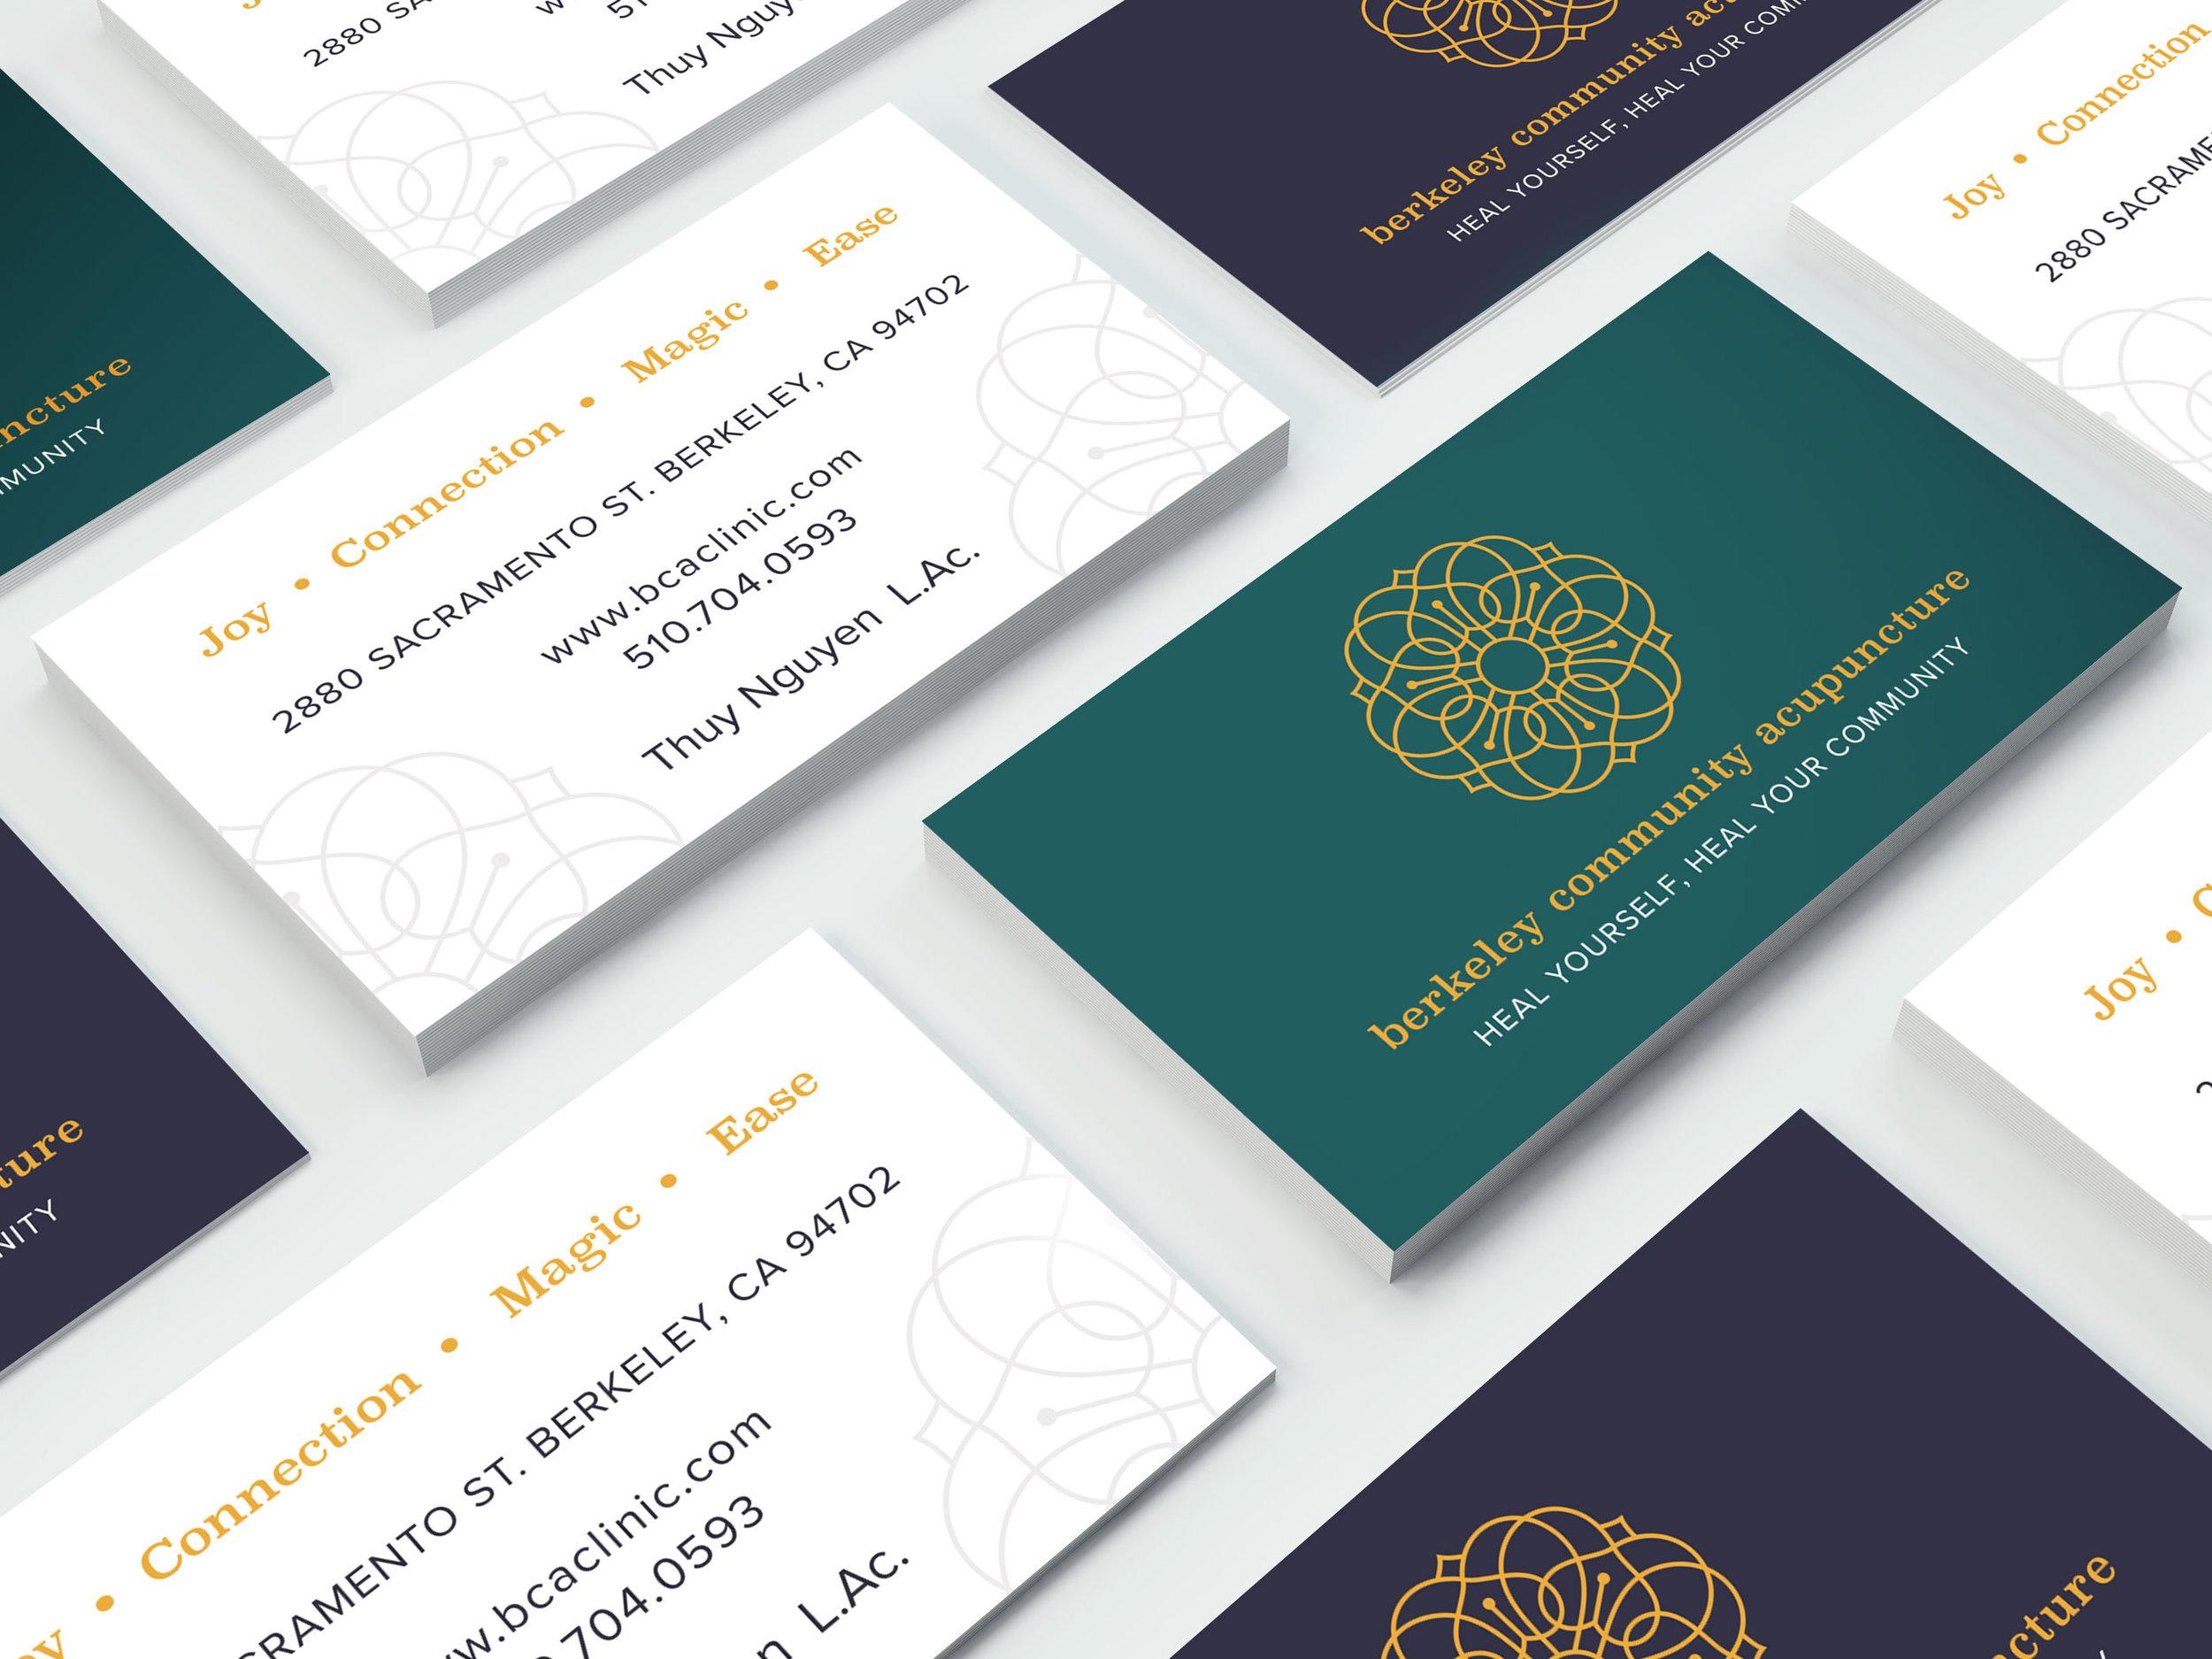 bca_business_cards.jpg